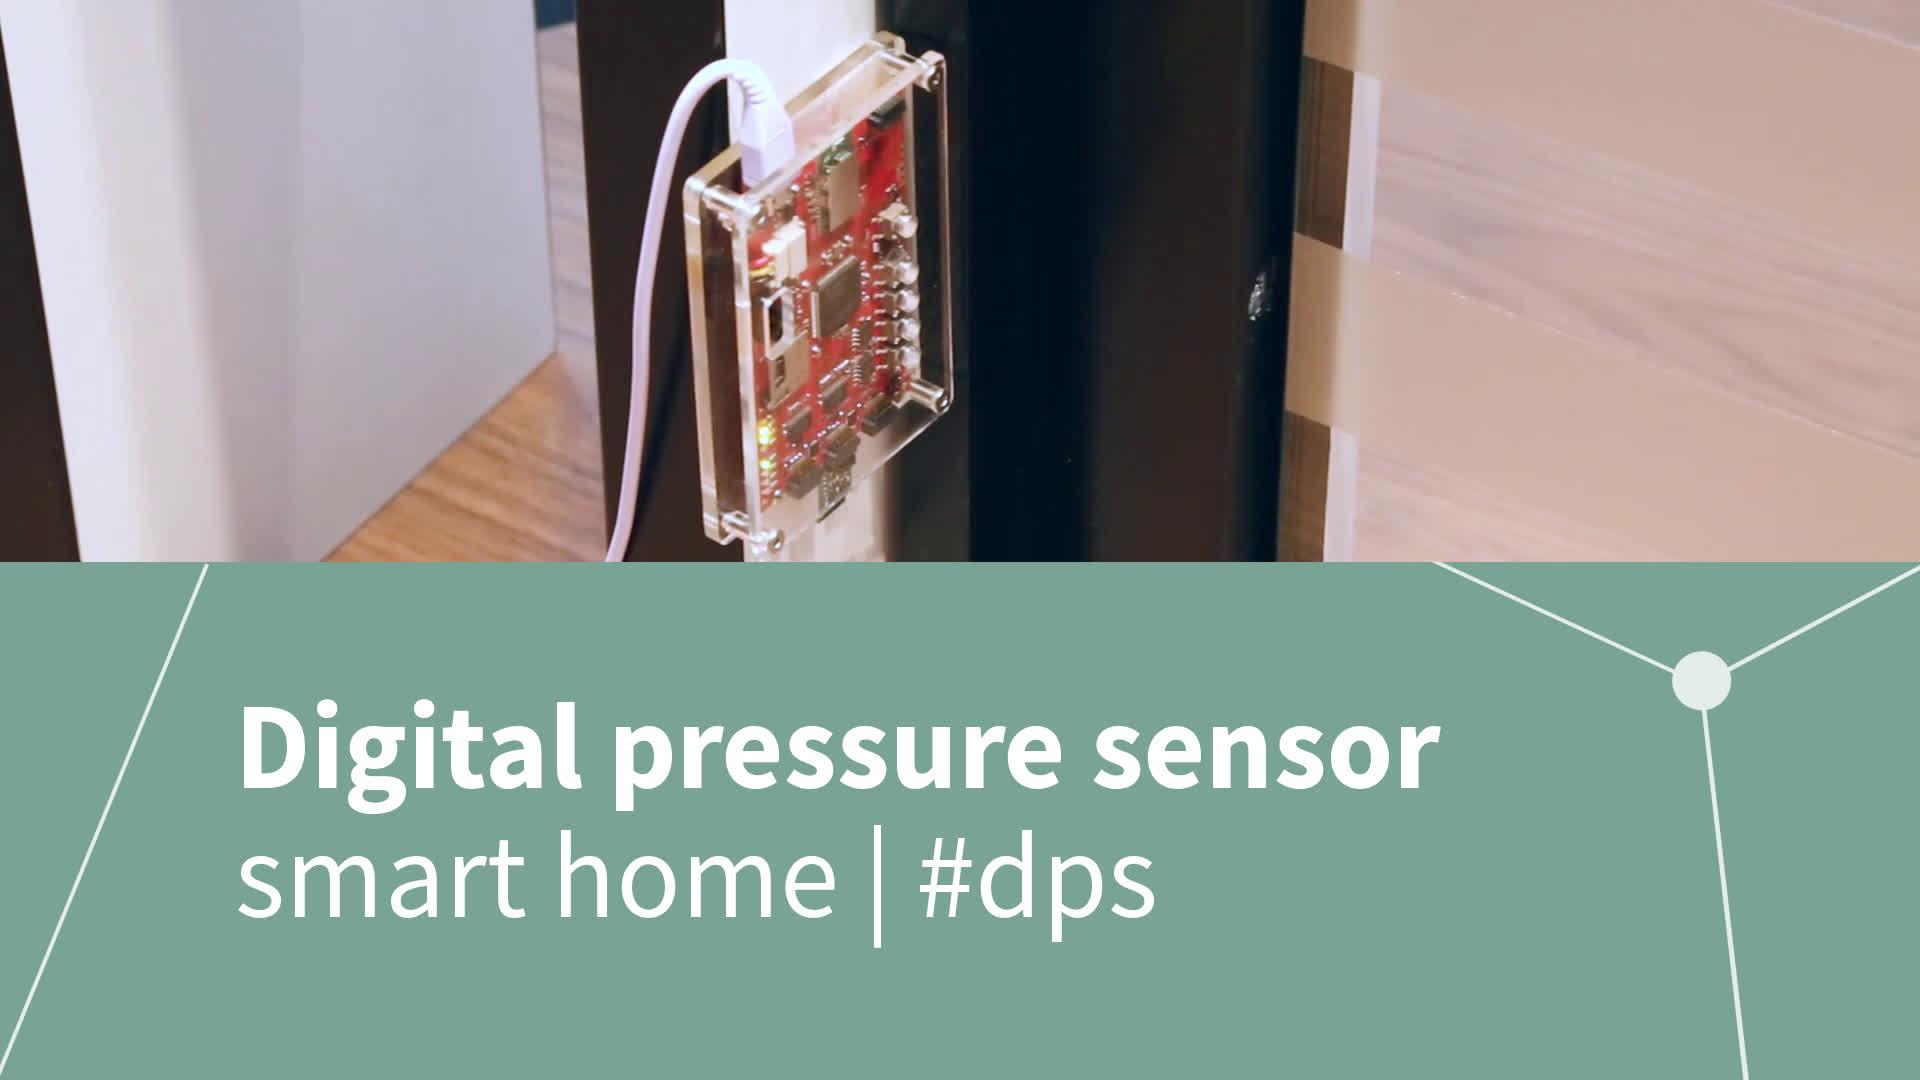 electronica 2016 - digital pressure sensor (DPS) @ ARROW booth